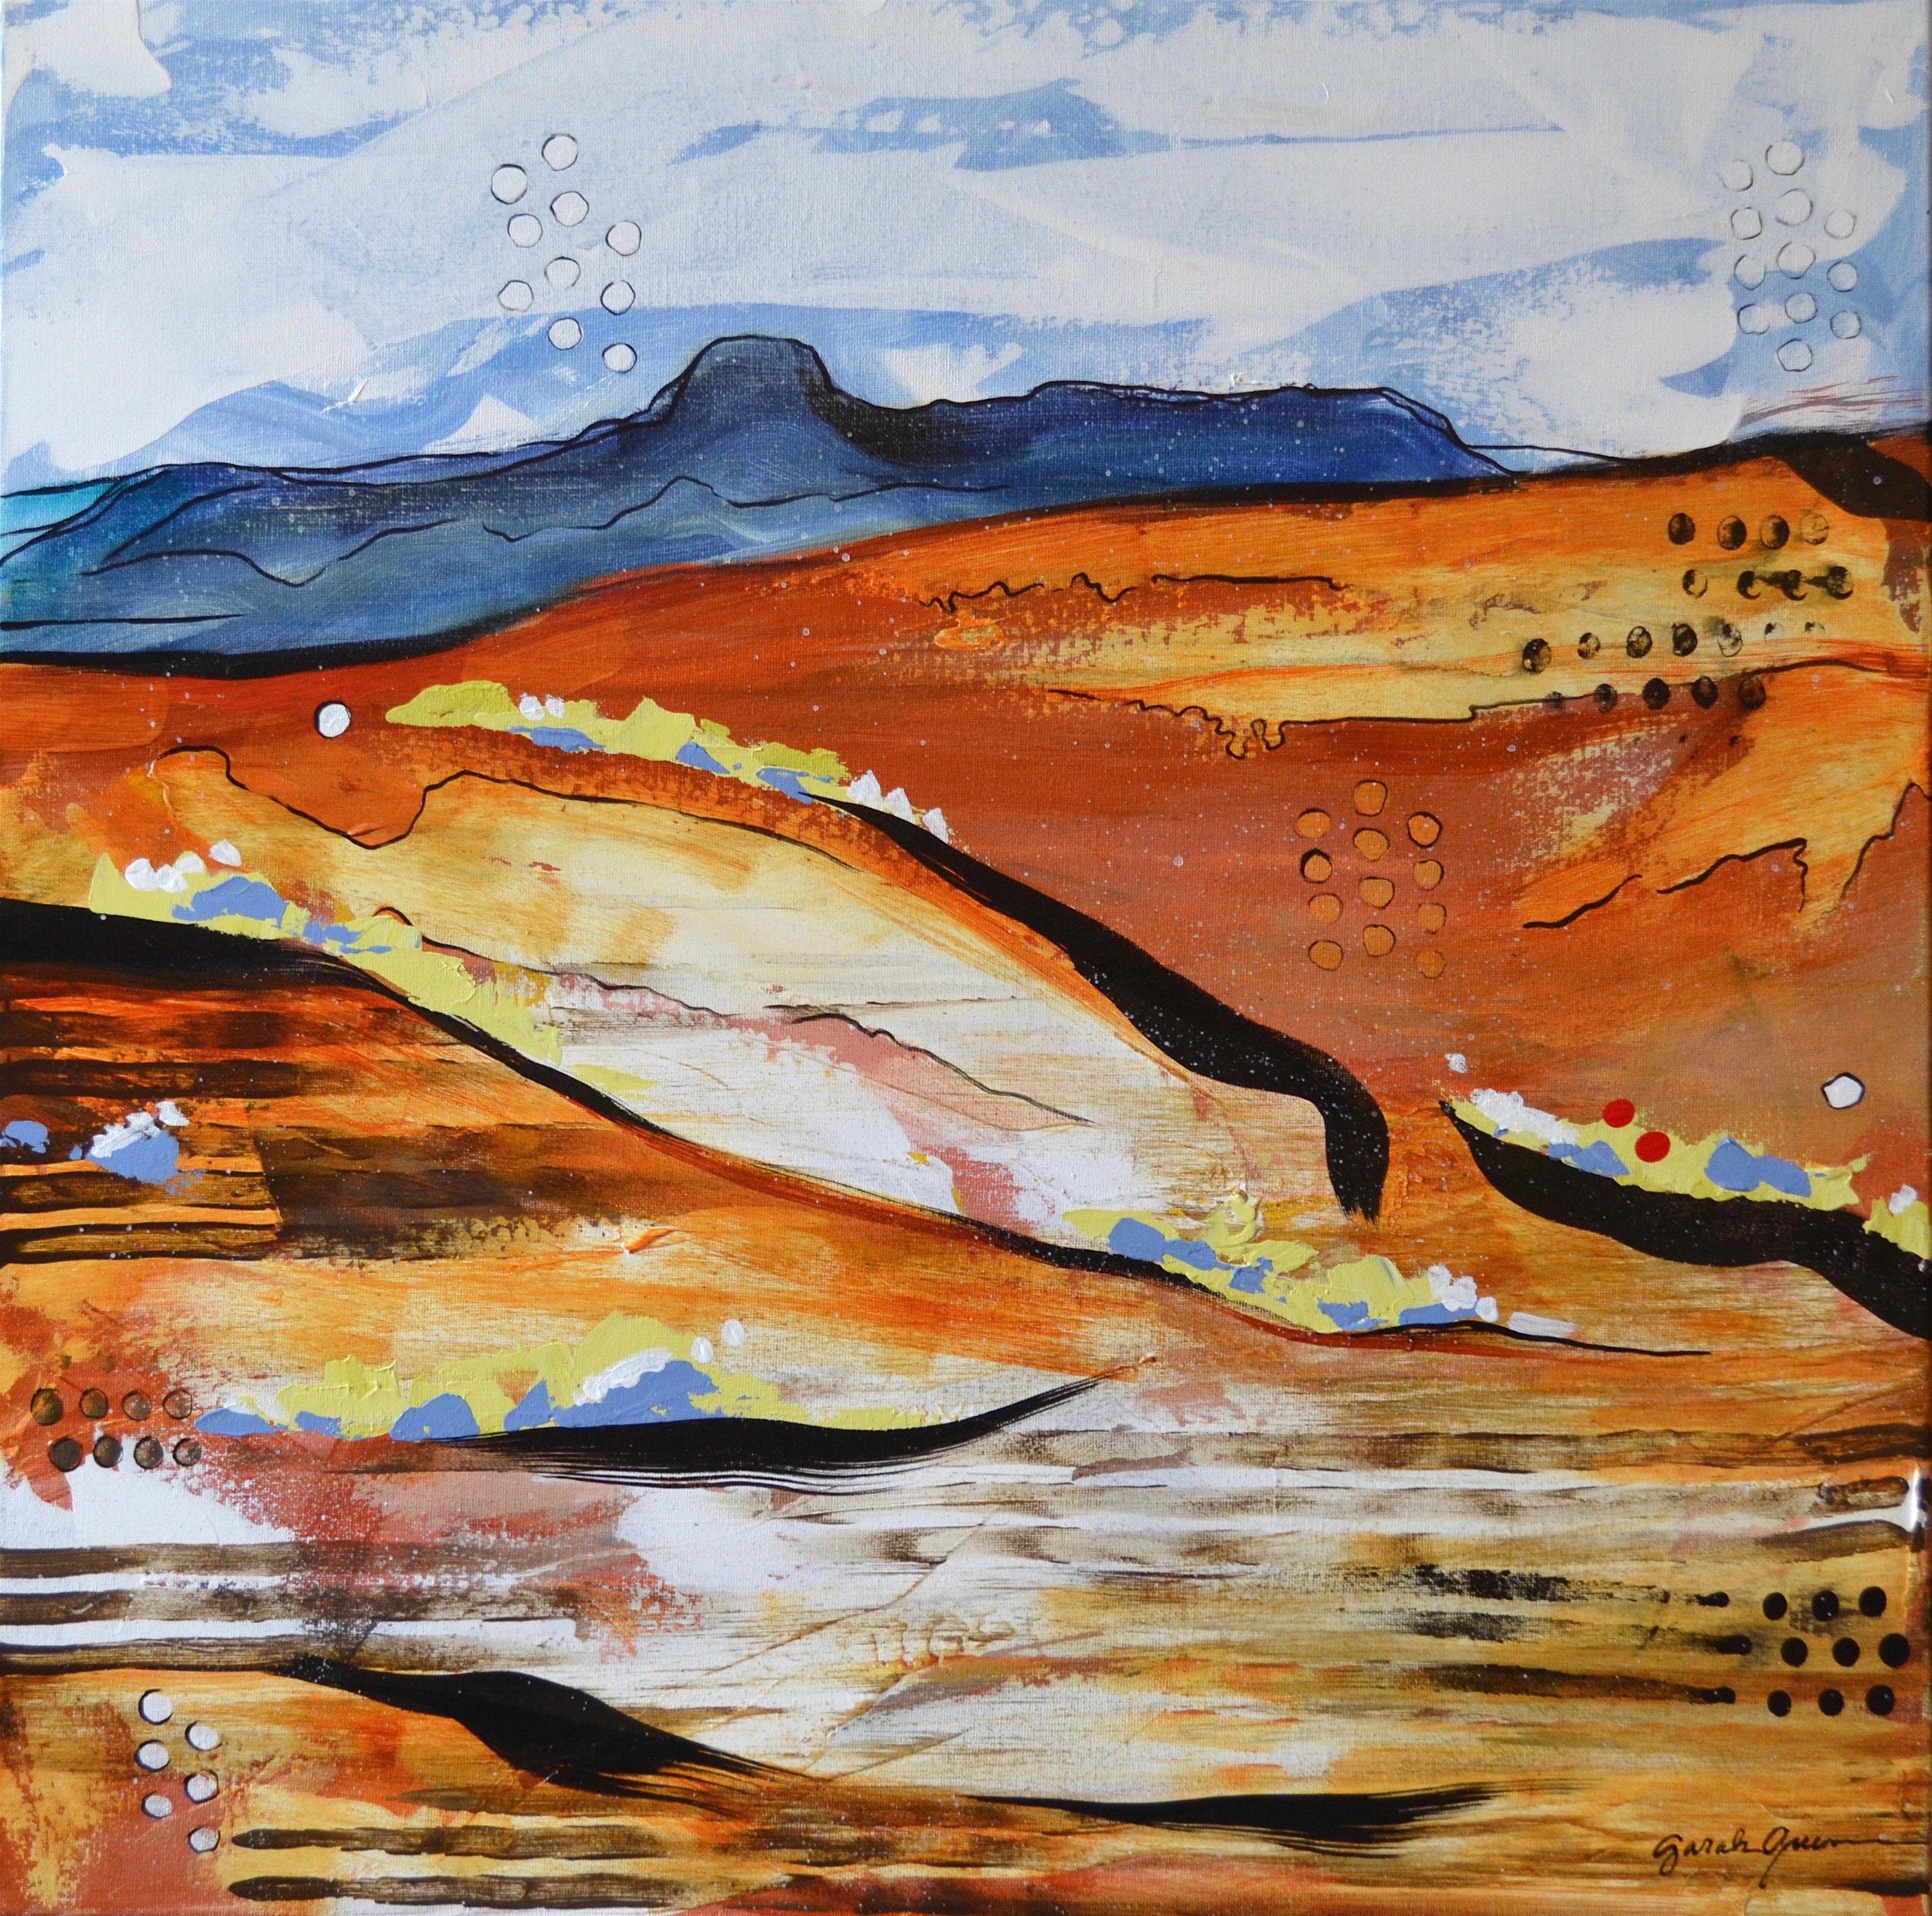 Kingdom of Daylight 2  | 24 x 24 inch acrylic on canvas